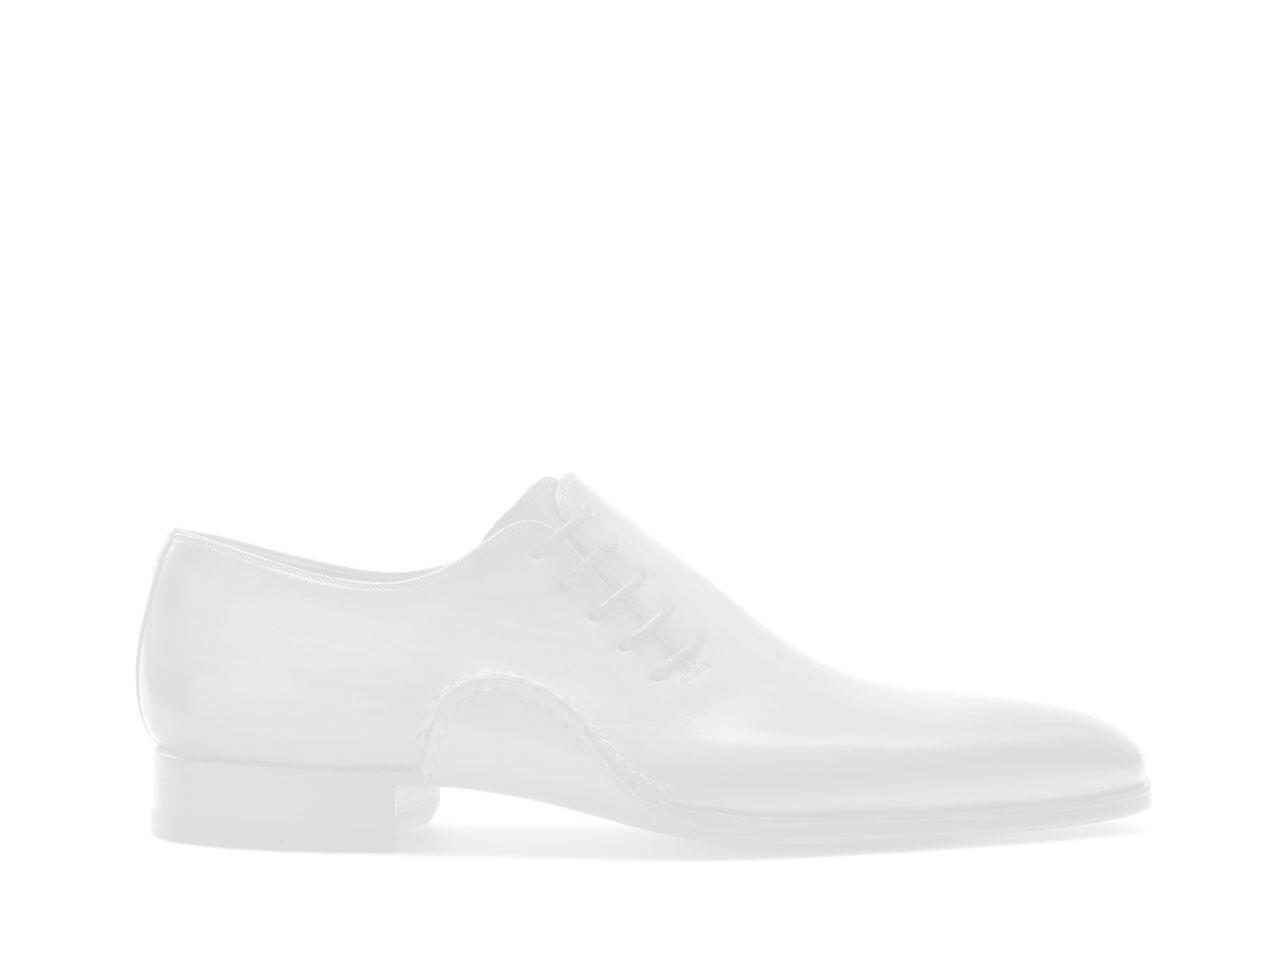 Sole of the Magnanni Rafa II Black Men's Loafers